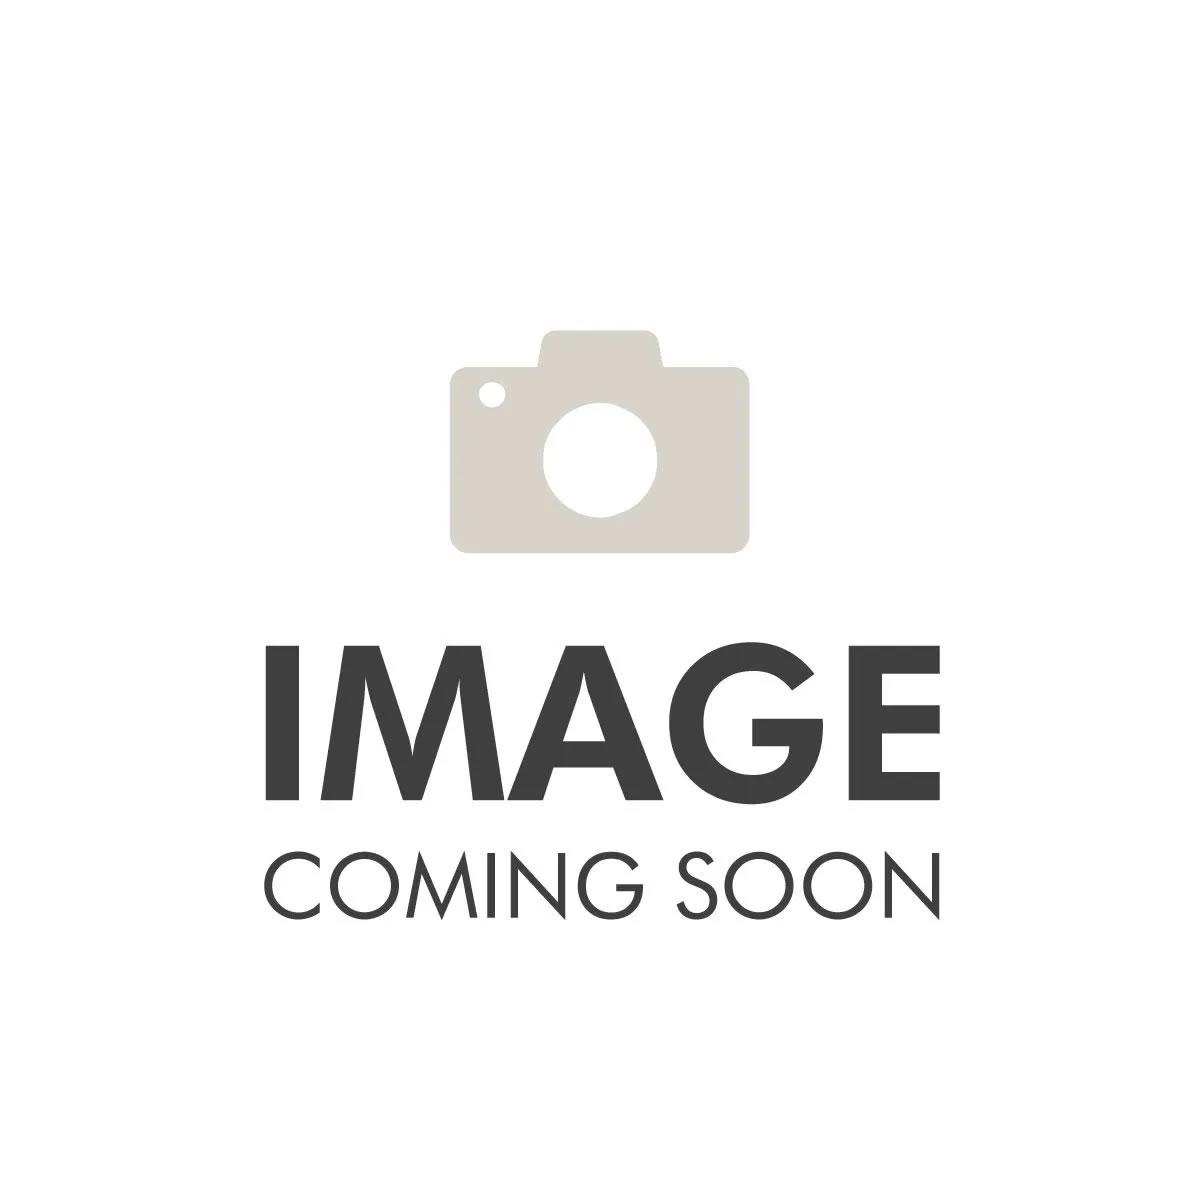 4 Inch Lift Kit with Shocks; 97-02 Jeep Wrangler TJ